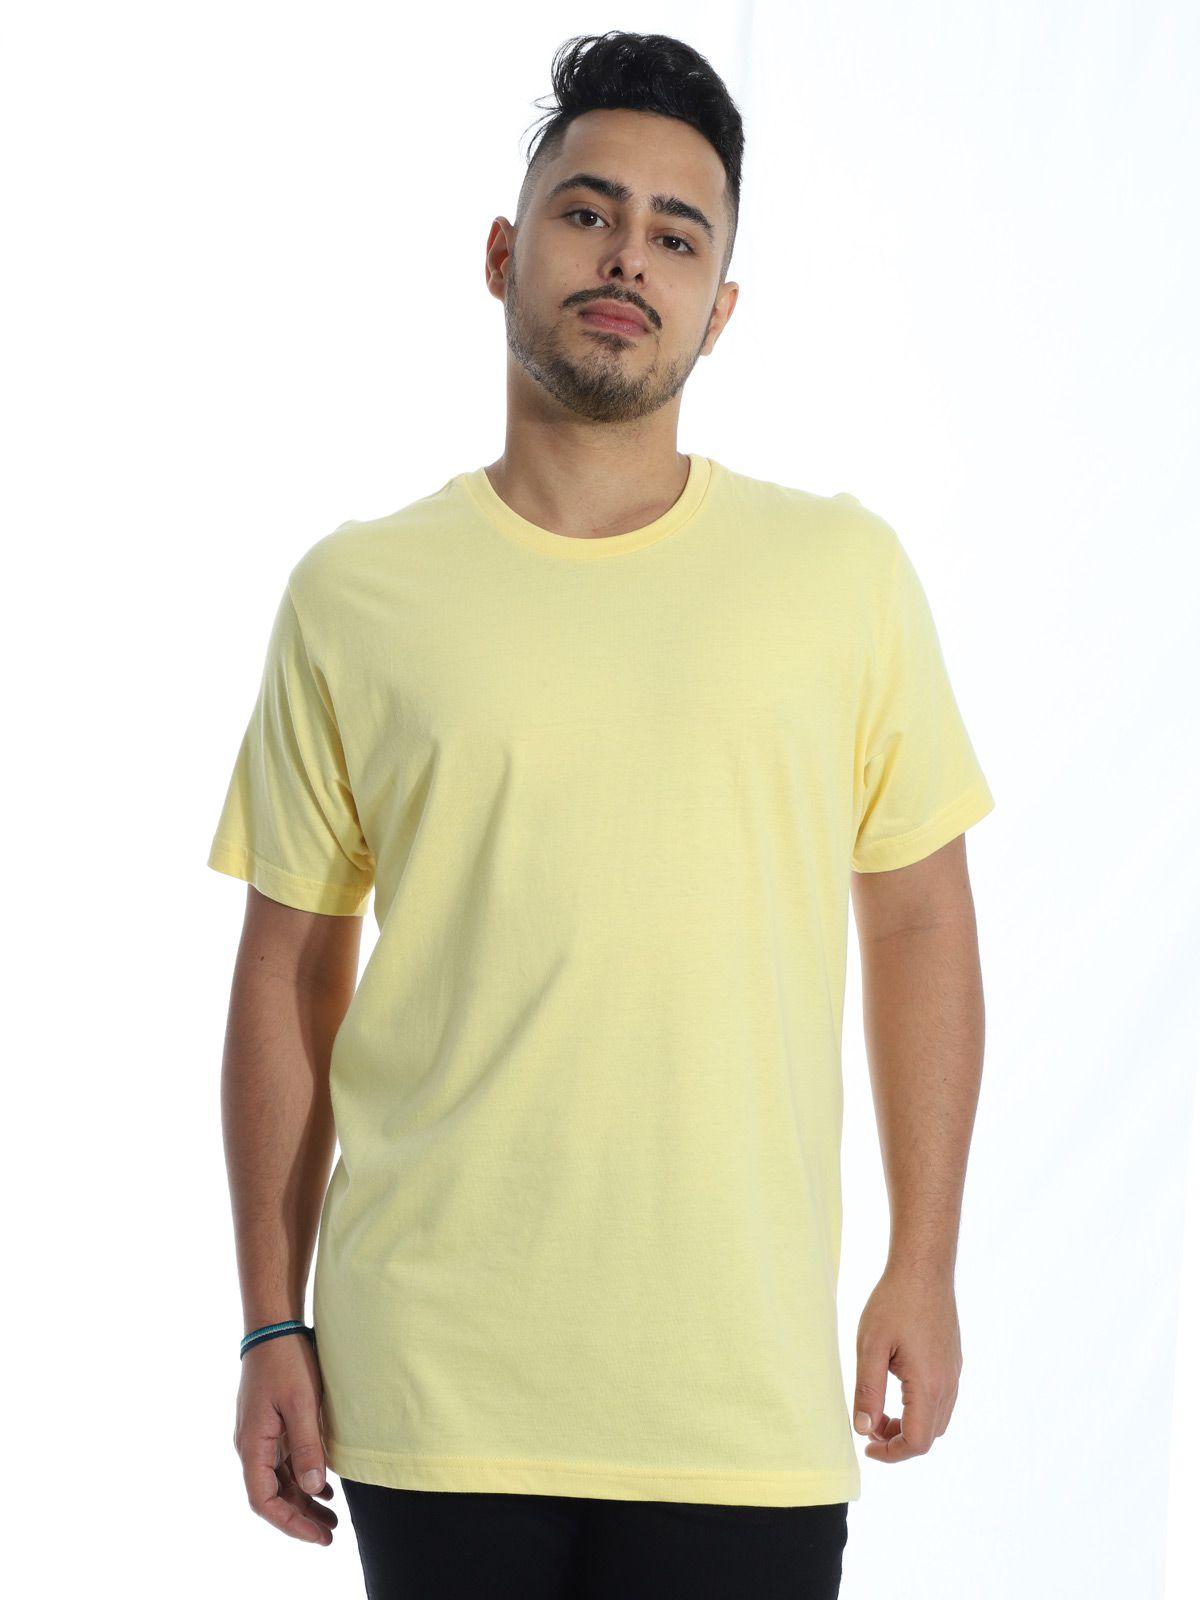 Camiseta Masculina Básica Lisa Amarelo